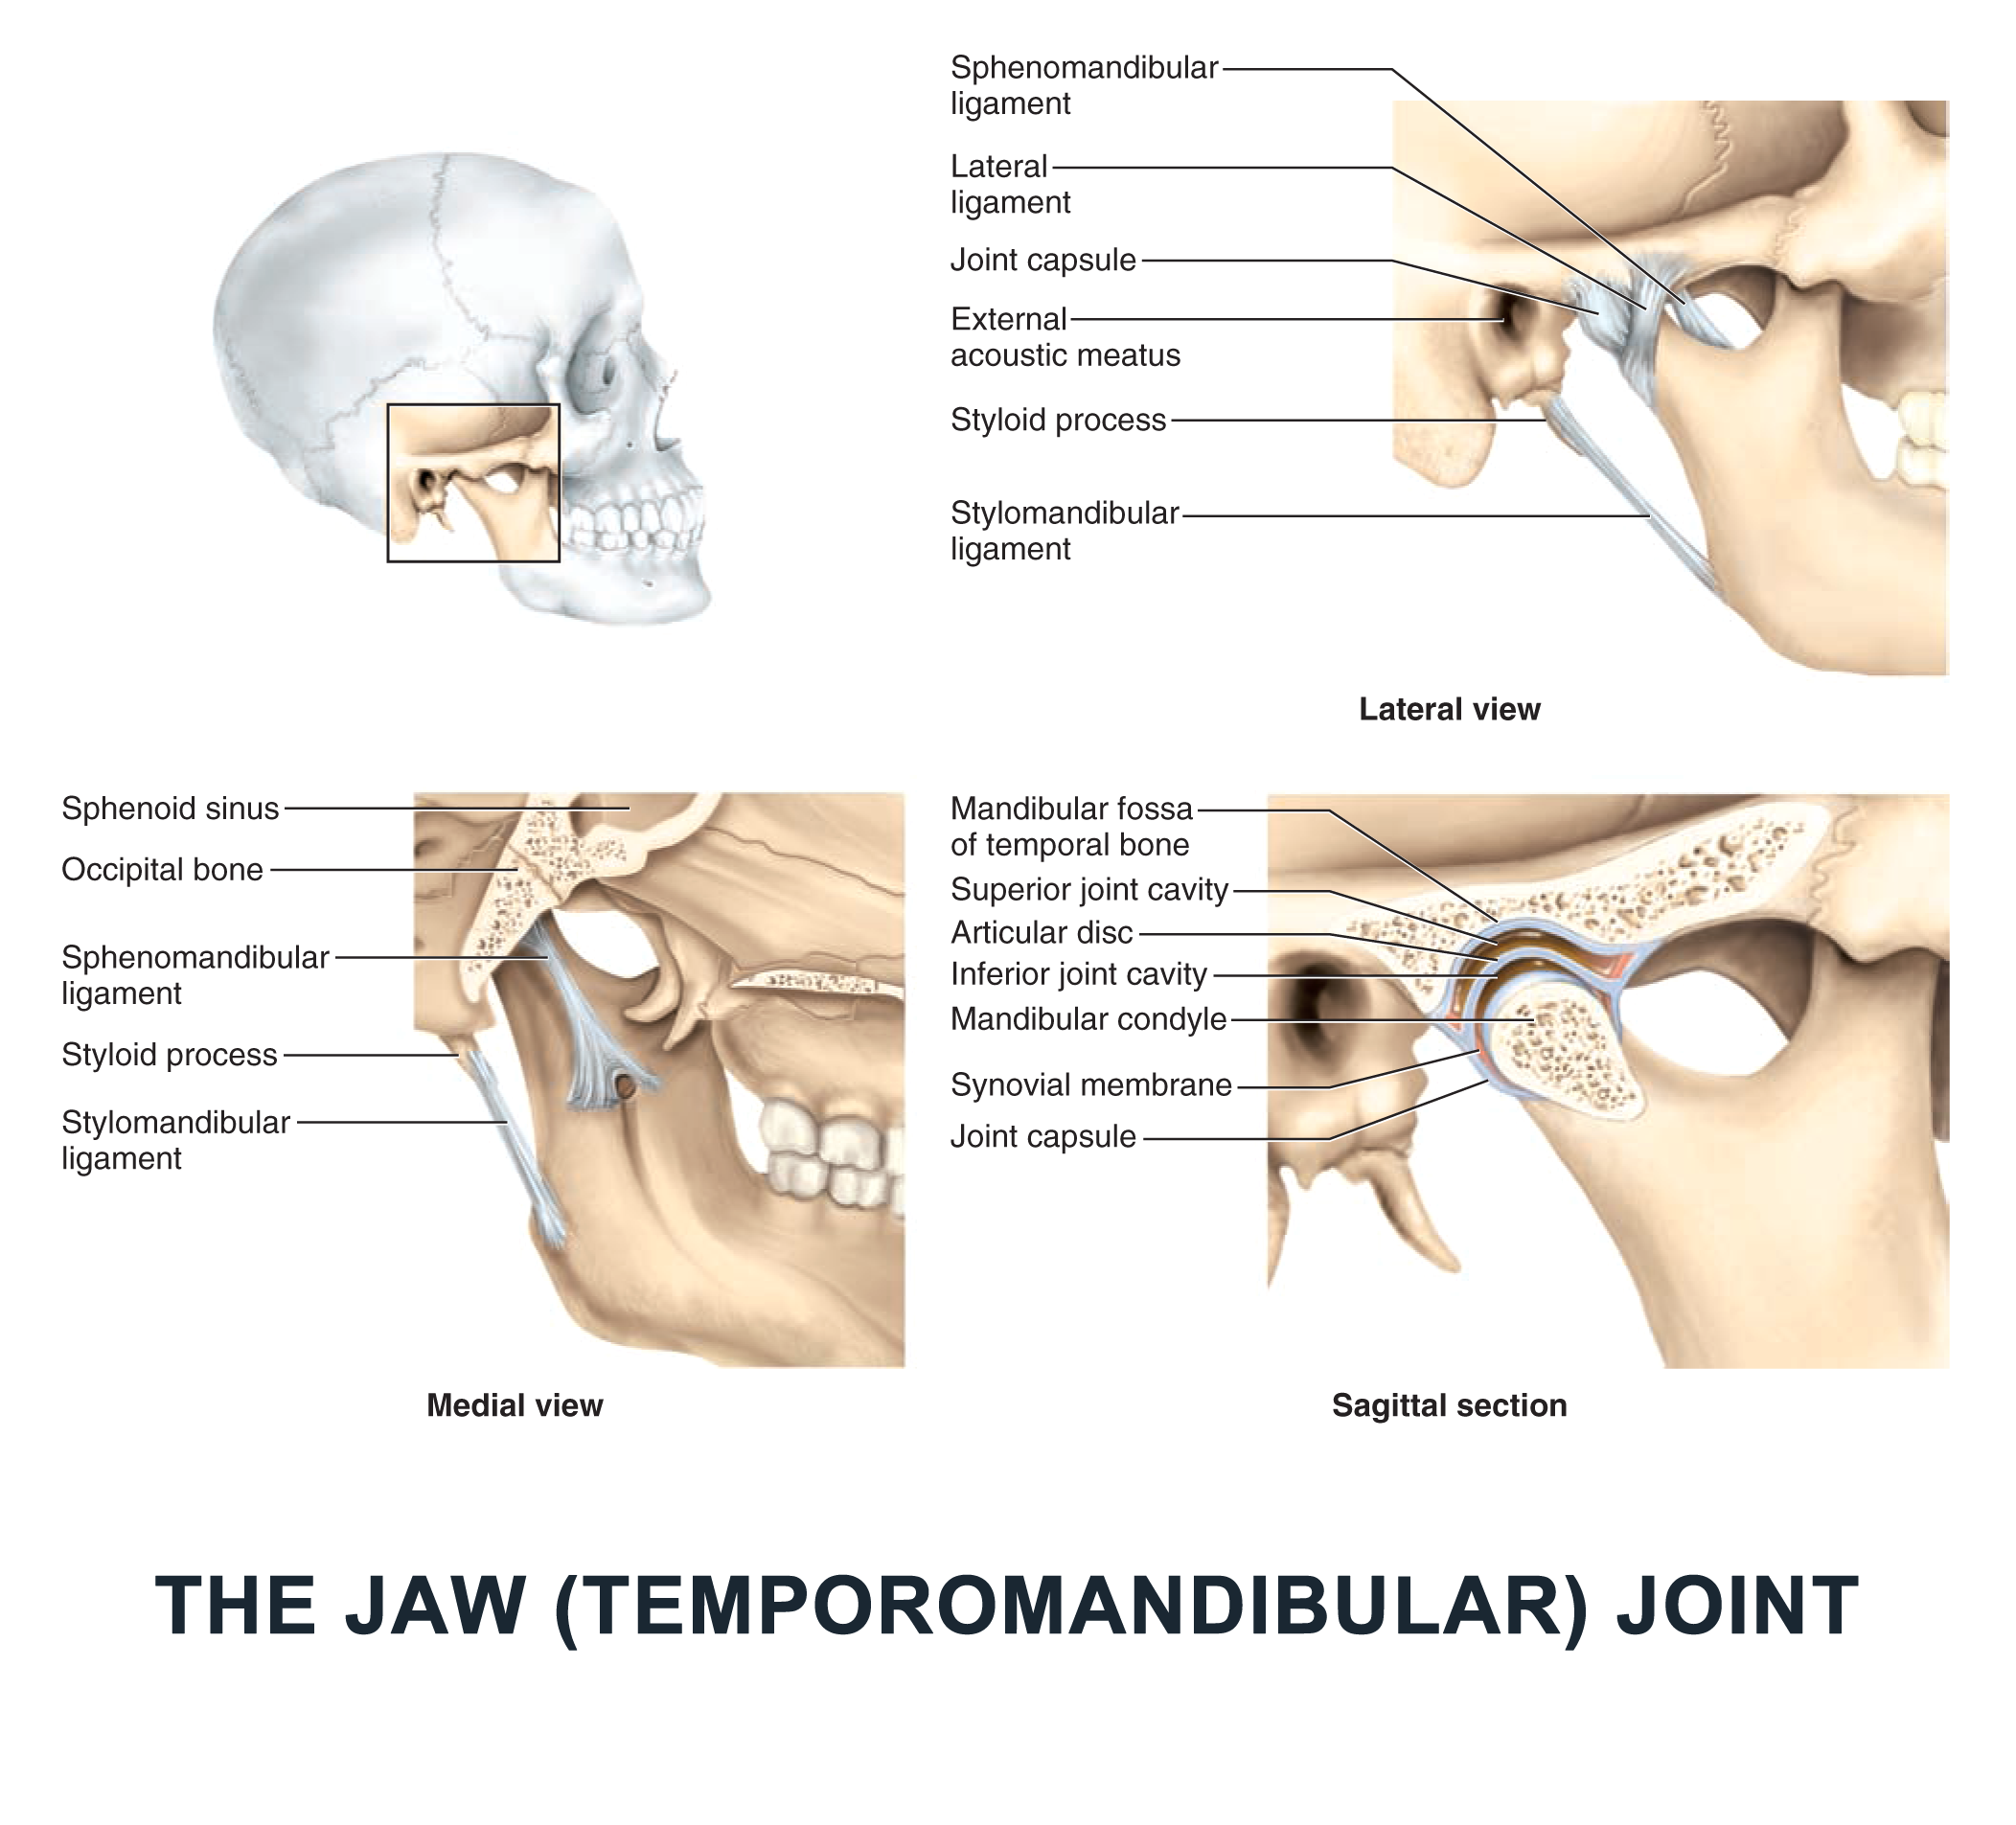 hight resolution of the jaw temporomandibular joint anatomy images illustrations anatomy images character design